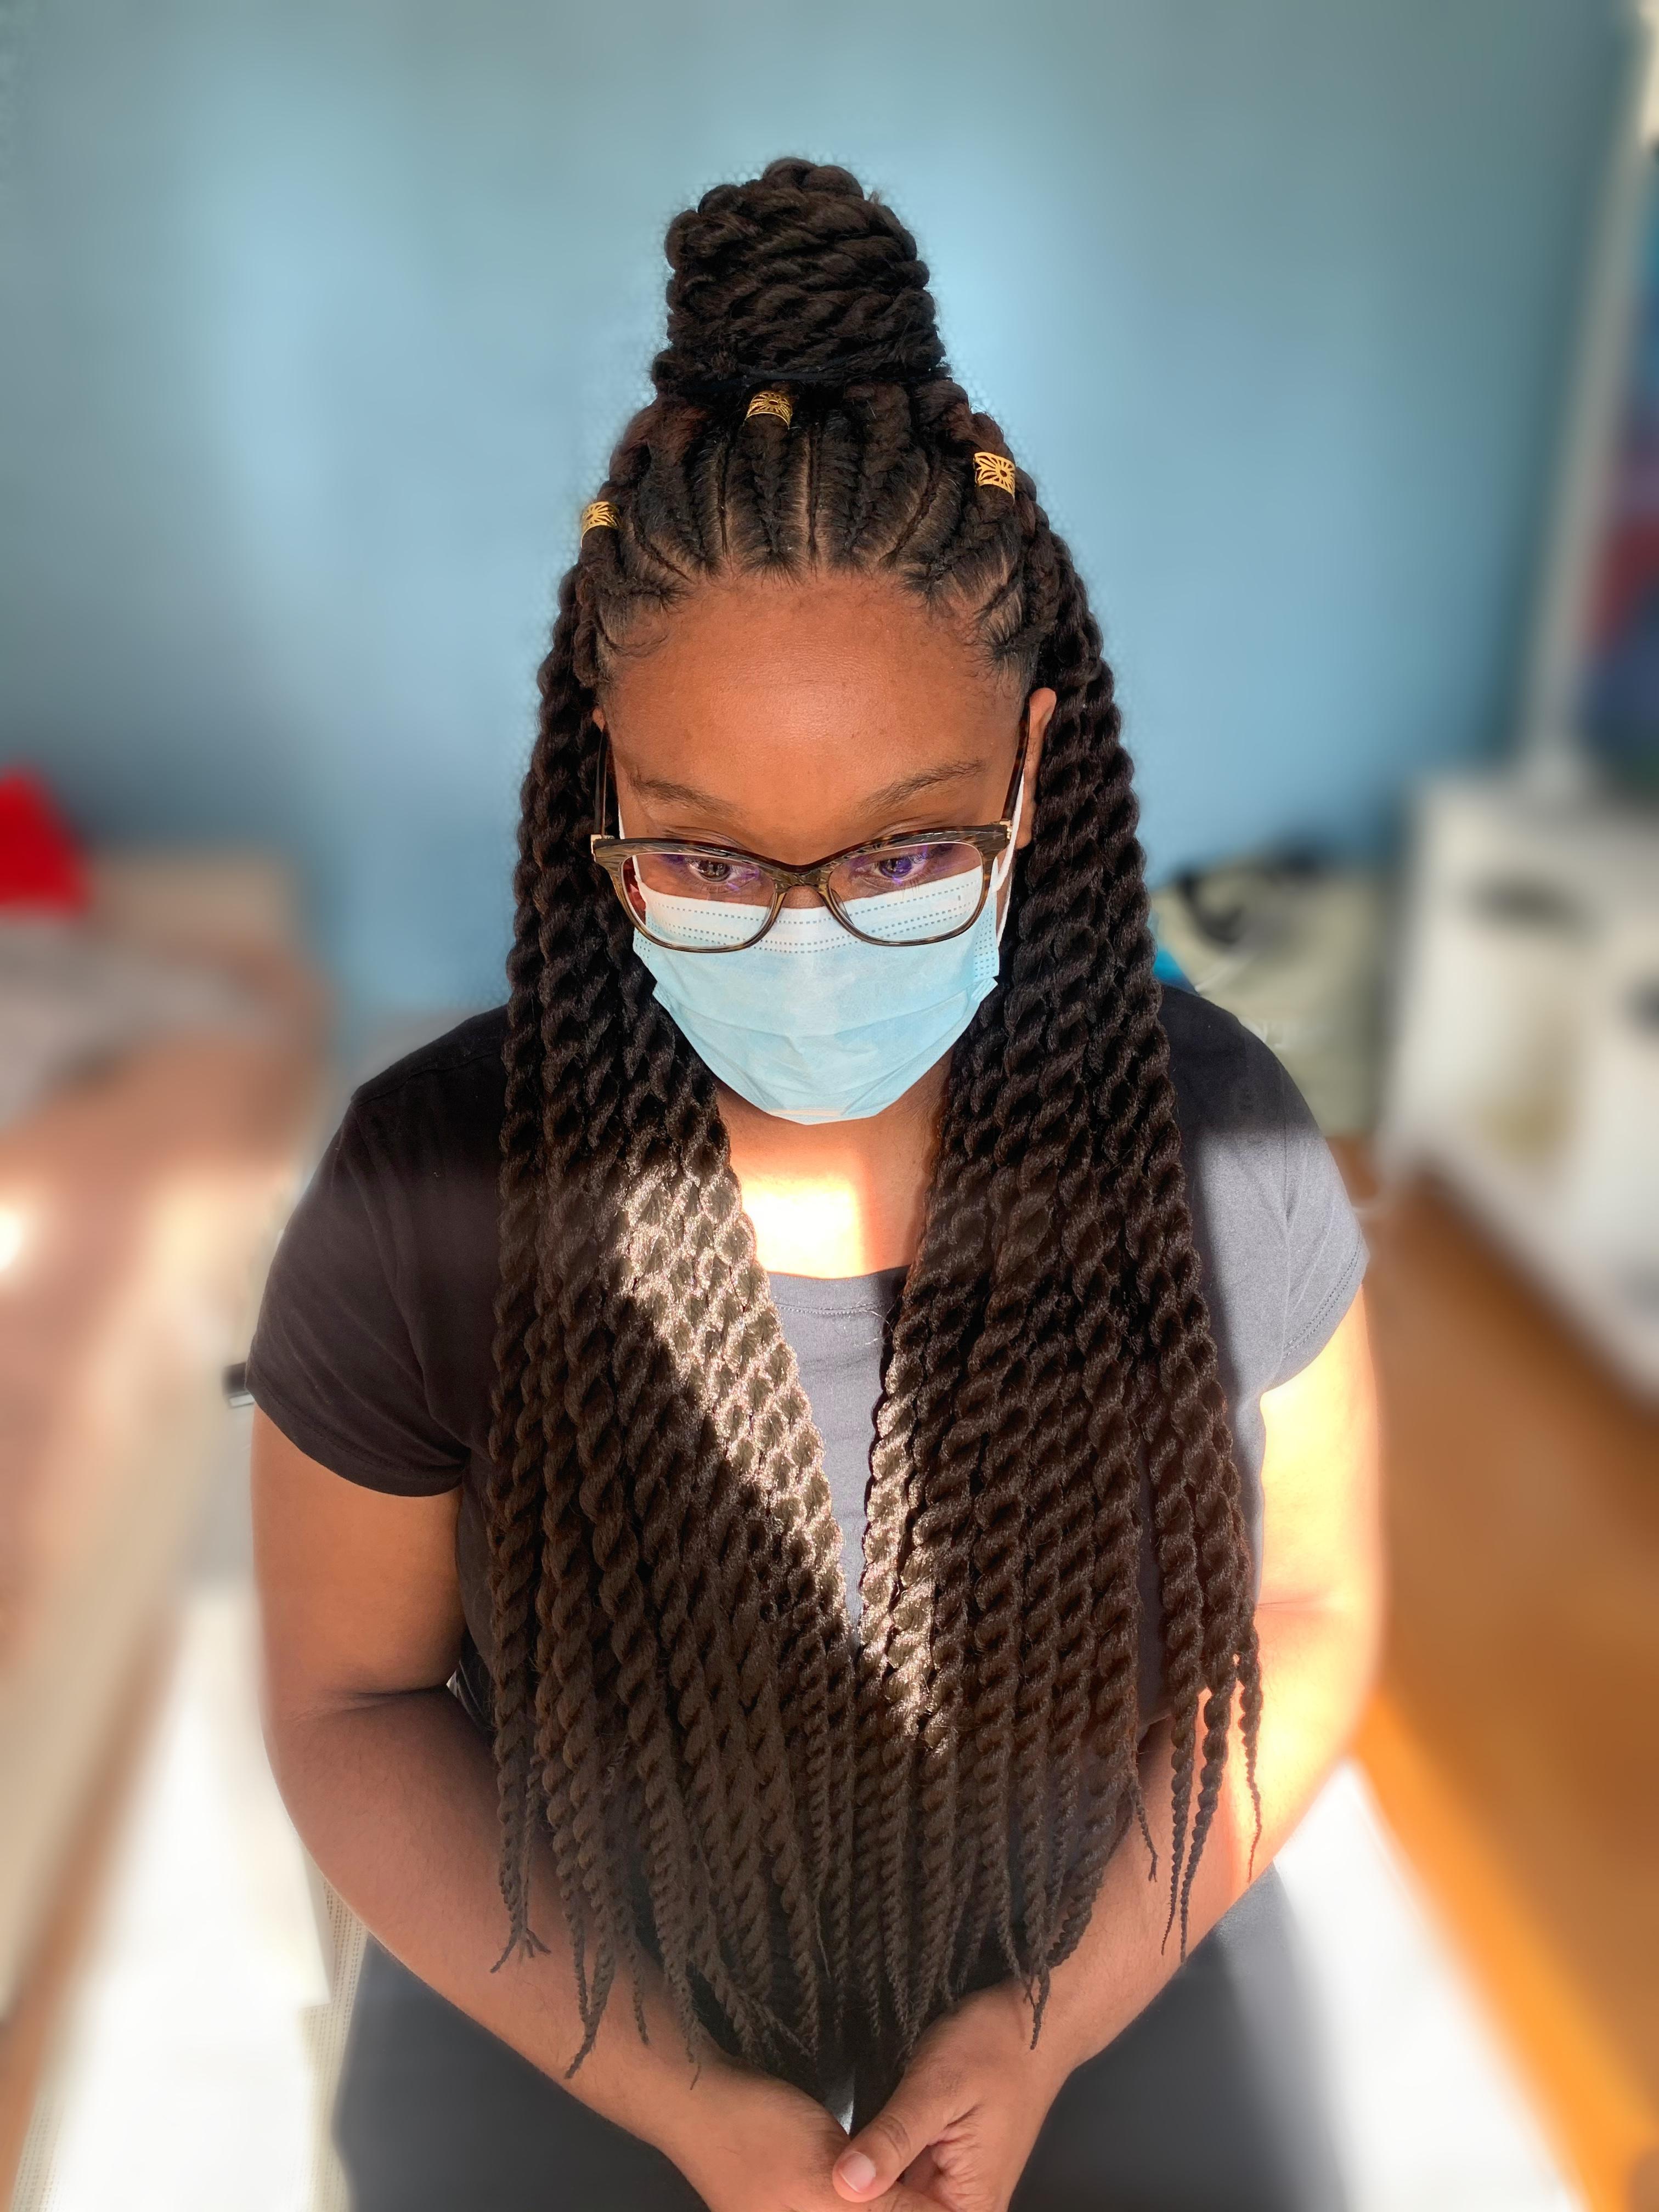 salon de coiffure afro tresse tresses box braids crochet braids vanilles tissages paris 75 77 78 91 92 93 94 95 PKFAZUDQ